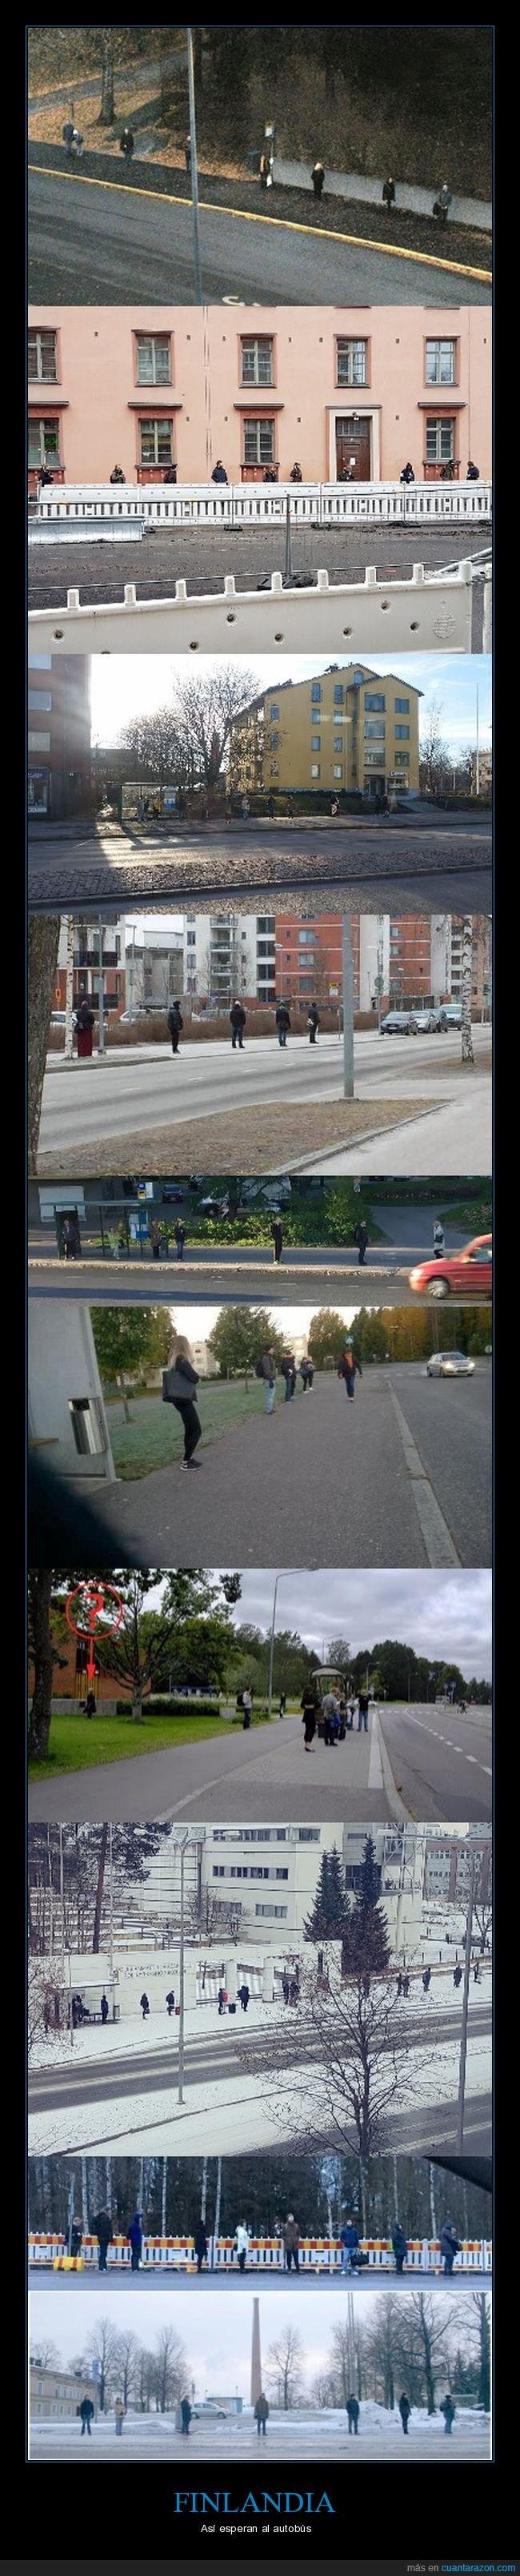 autobús,esperar,finlandia